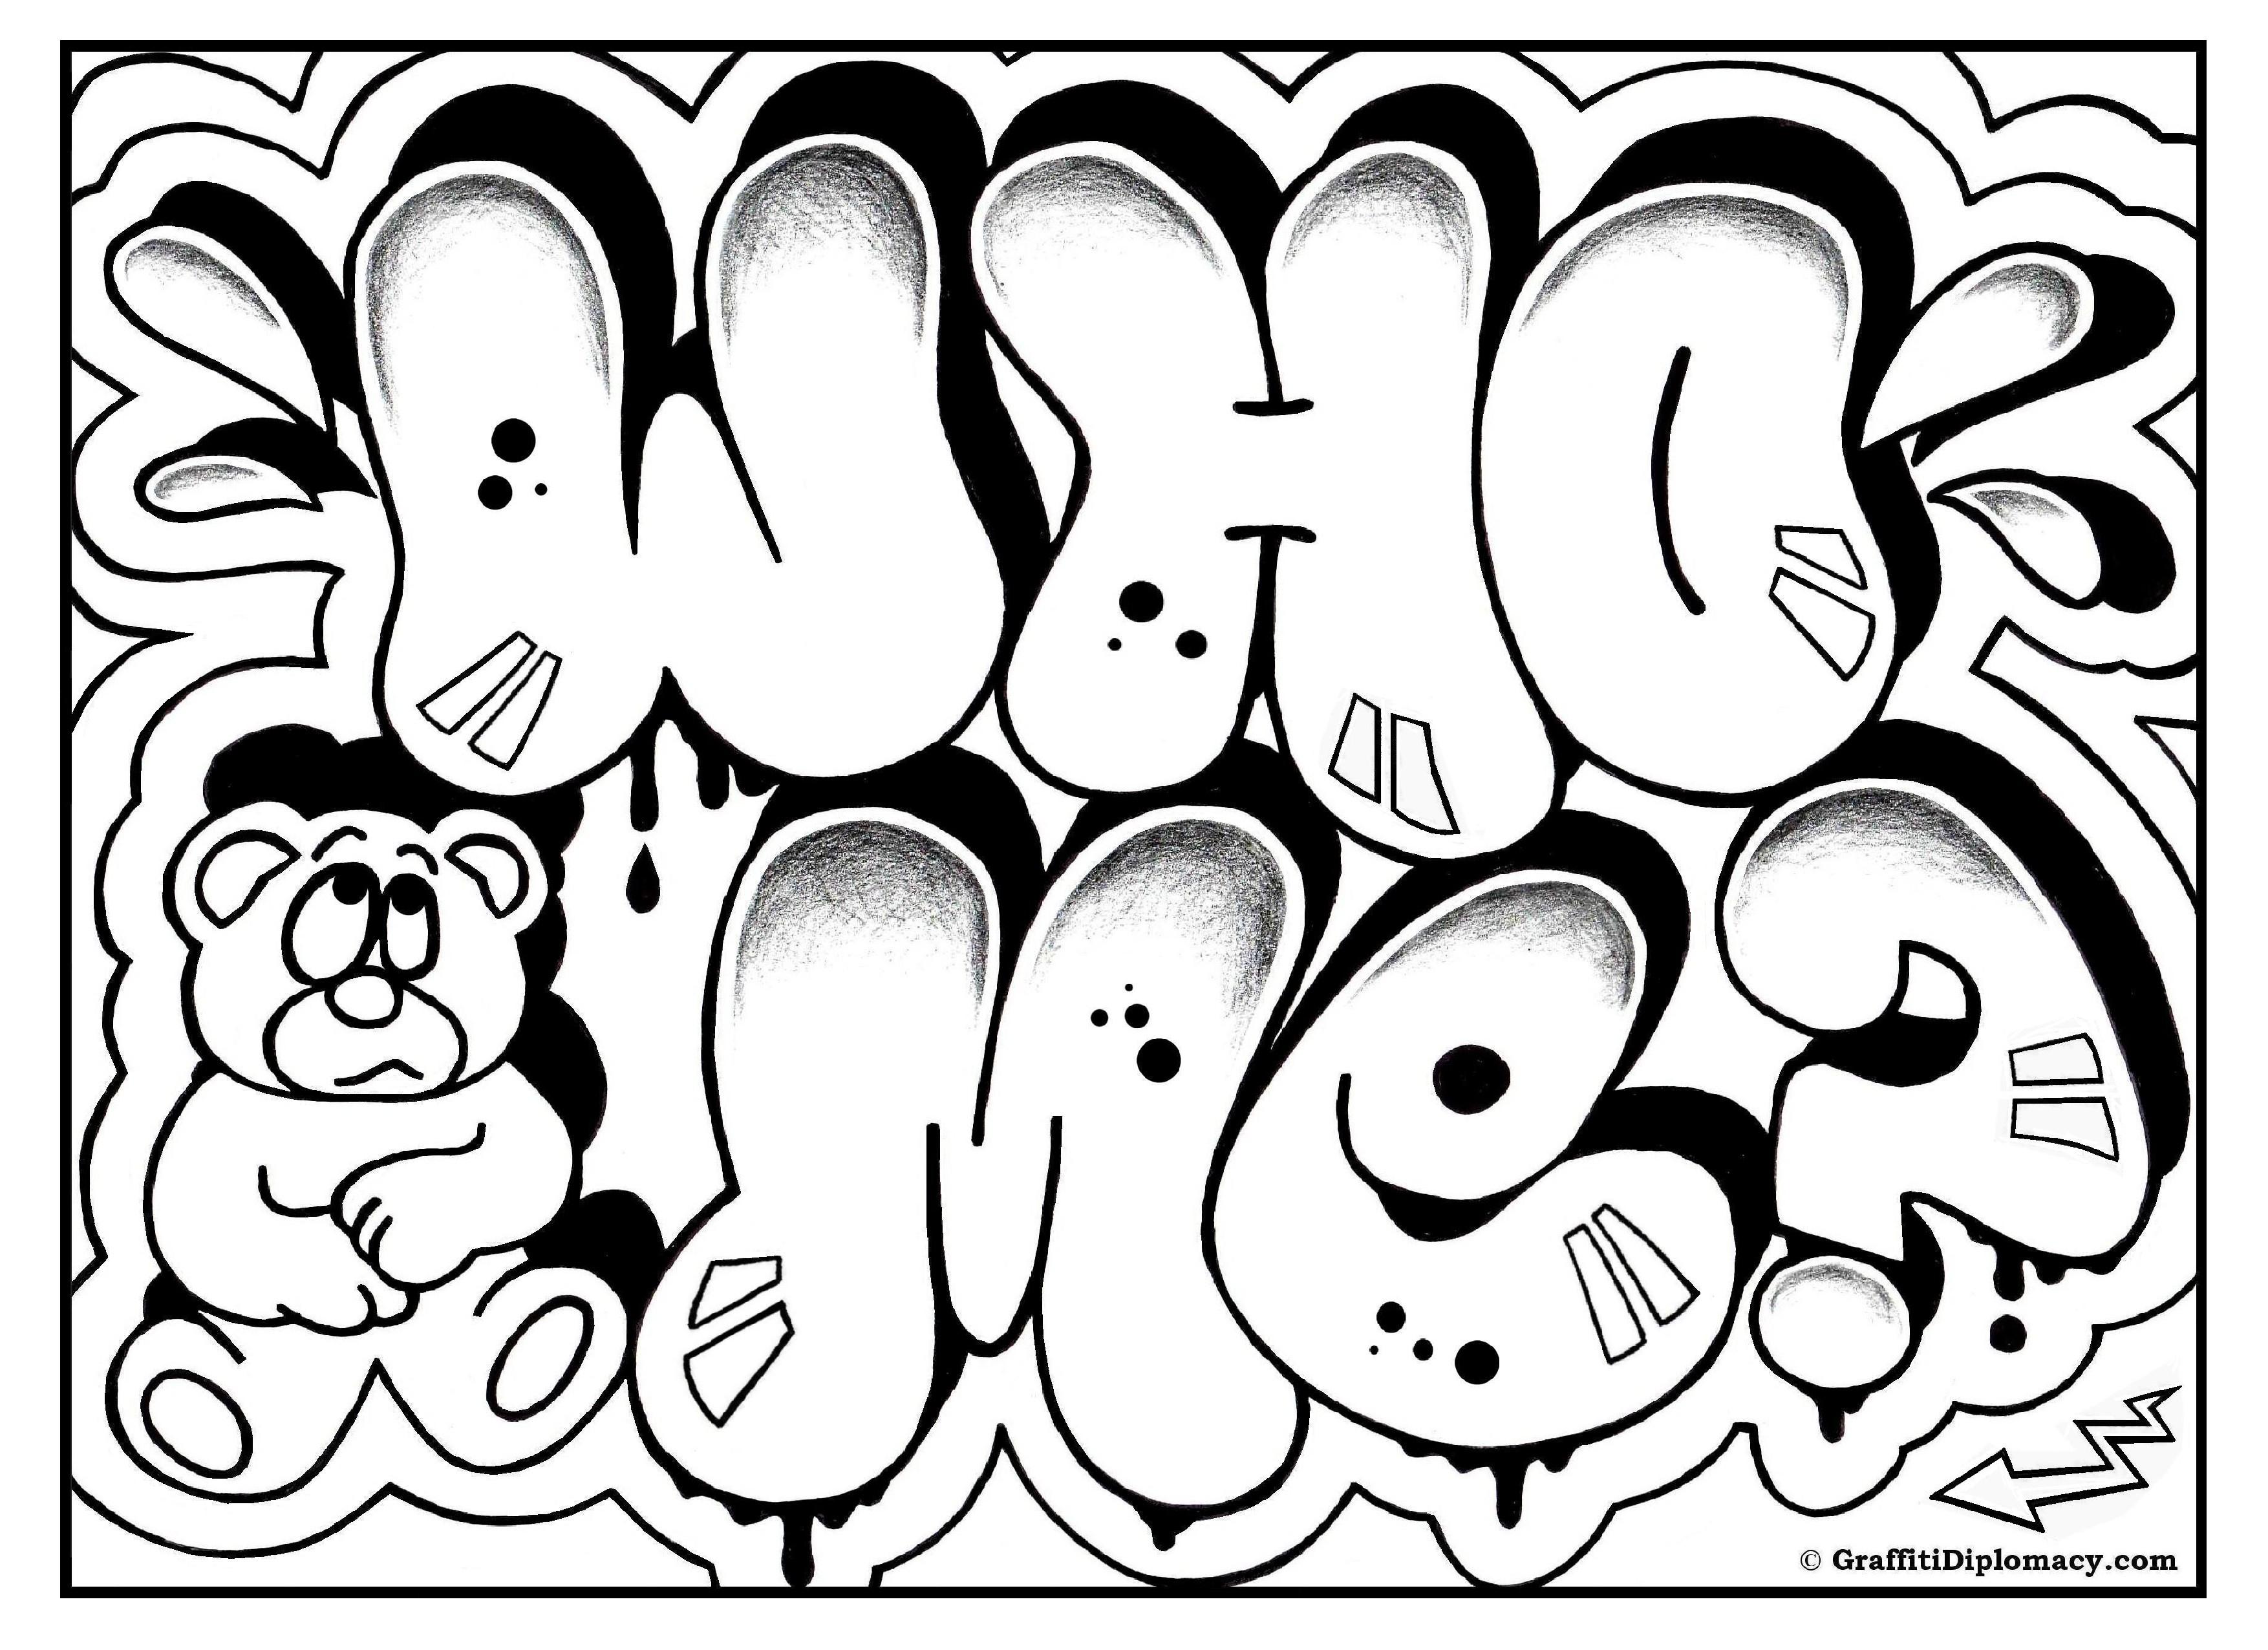 3508x2552 Graffiti Drawings Of Words Graffiti Words To Draw Community Wall